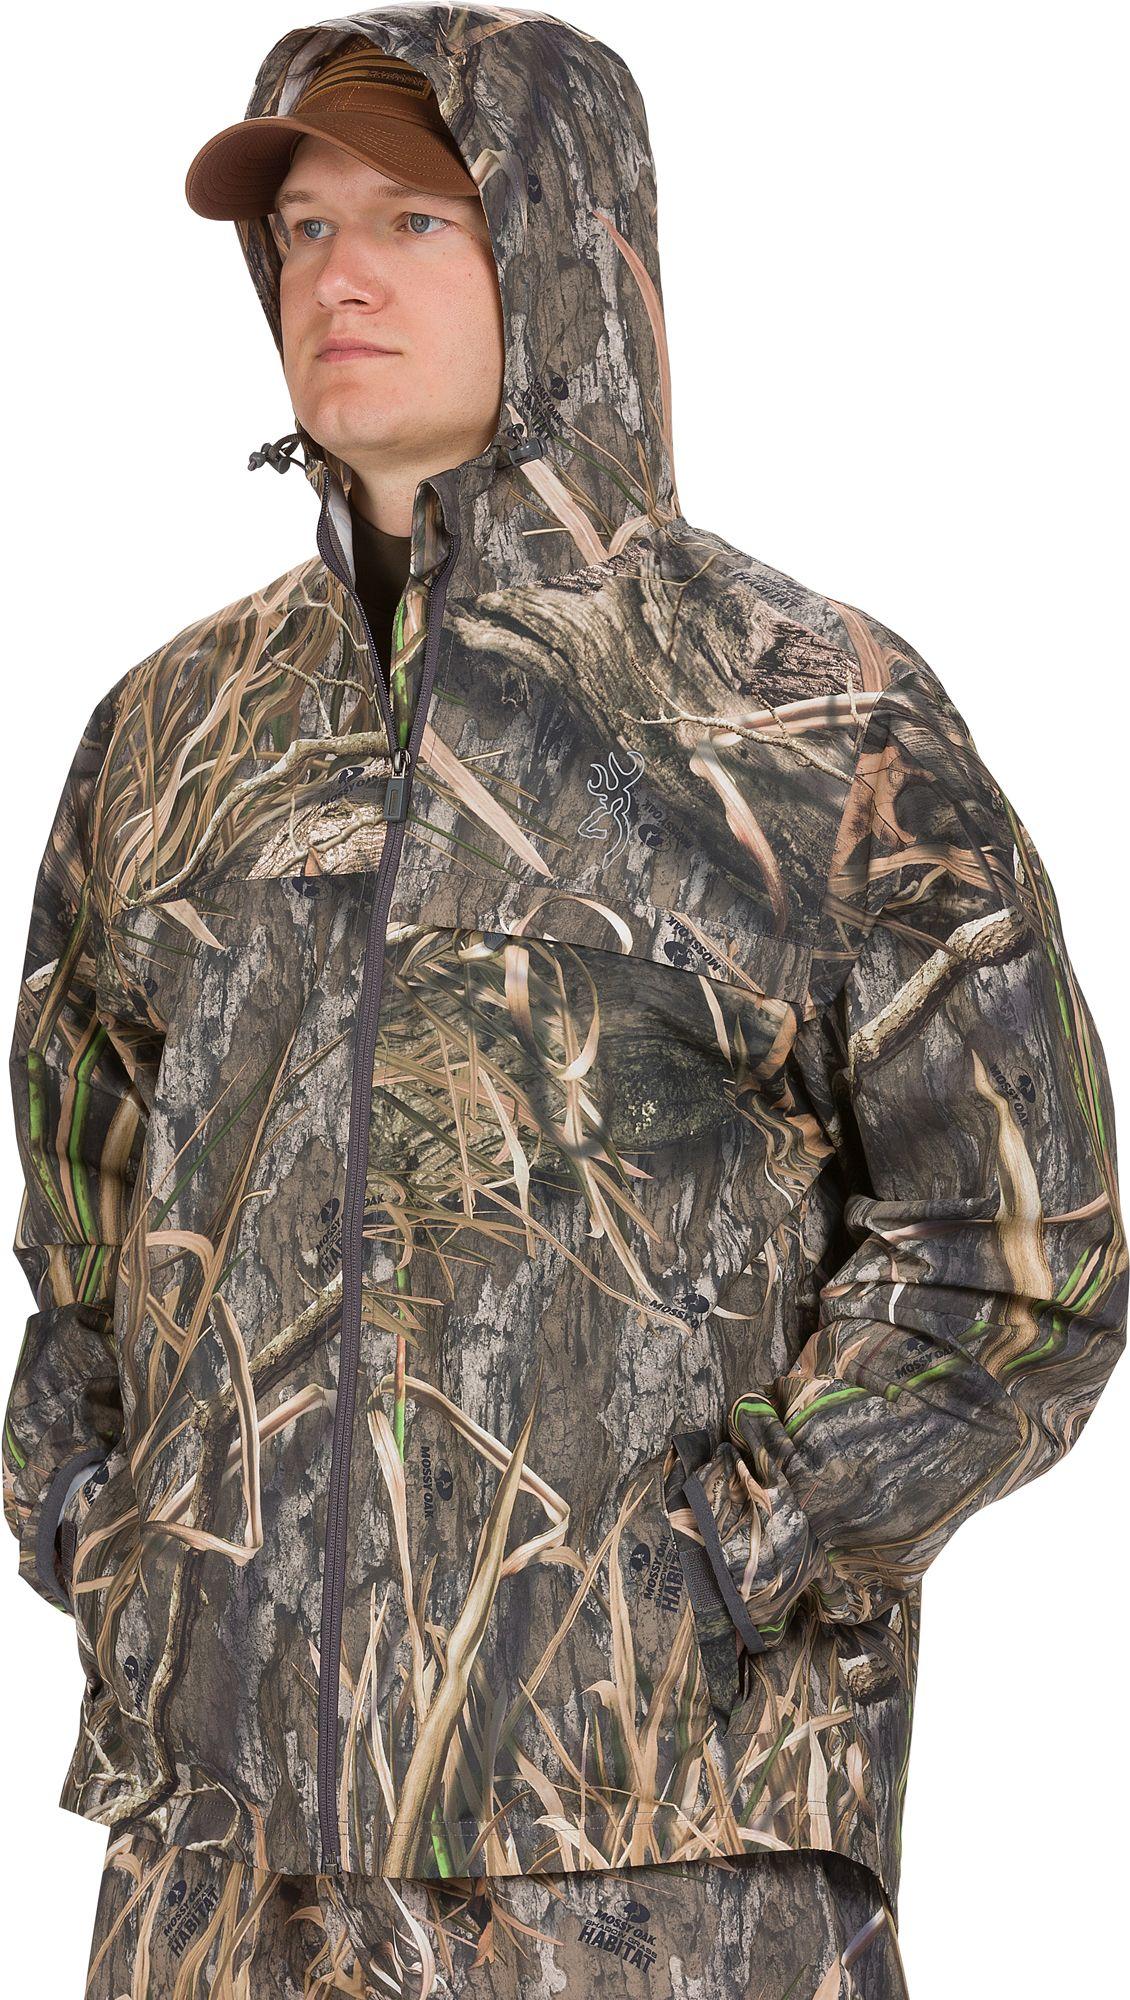 Browning CFS Hunting Rain Jacket, Men's, Medium, Mossy Oak Shadow Grass thumbnail